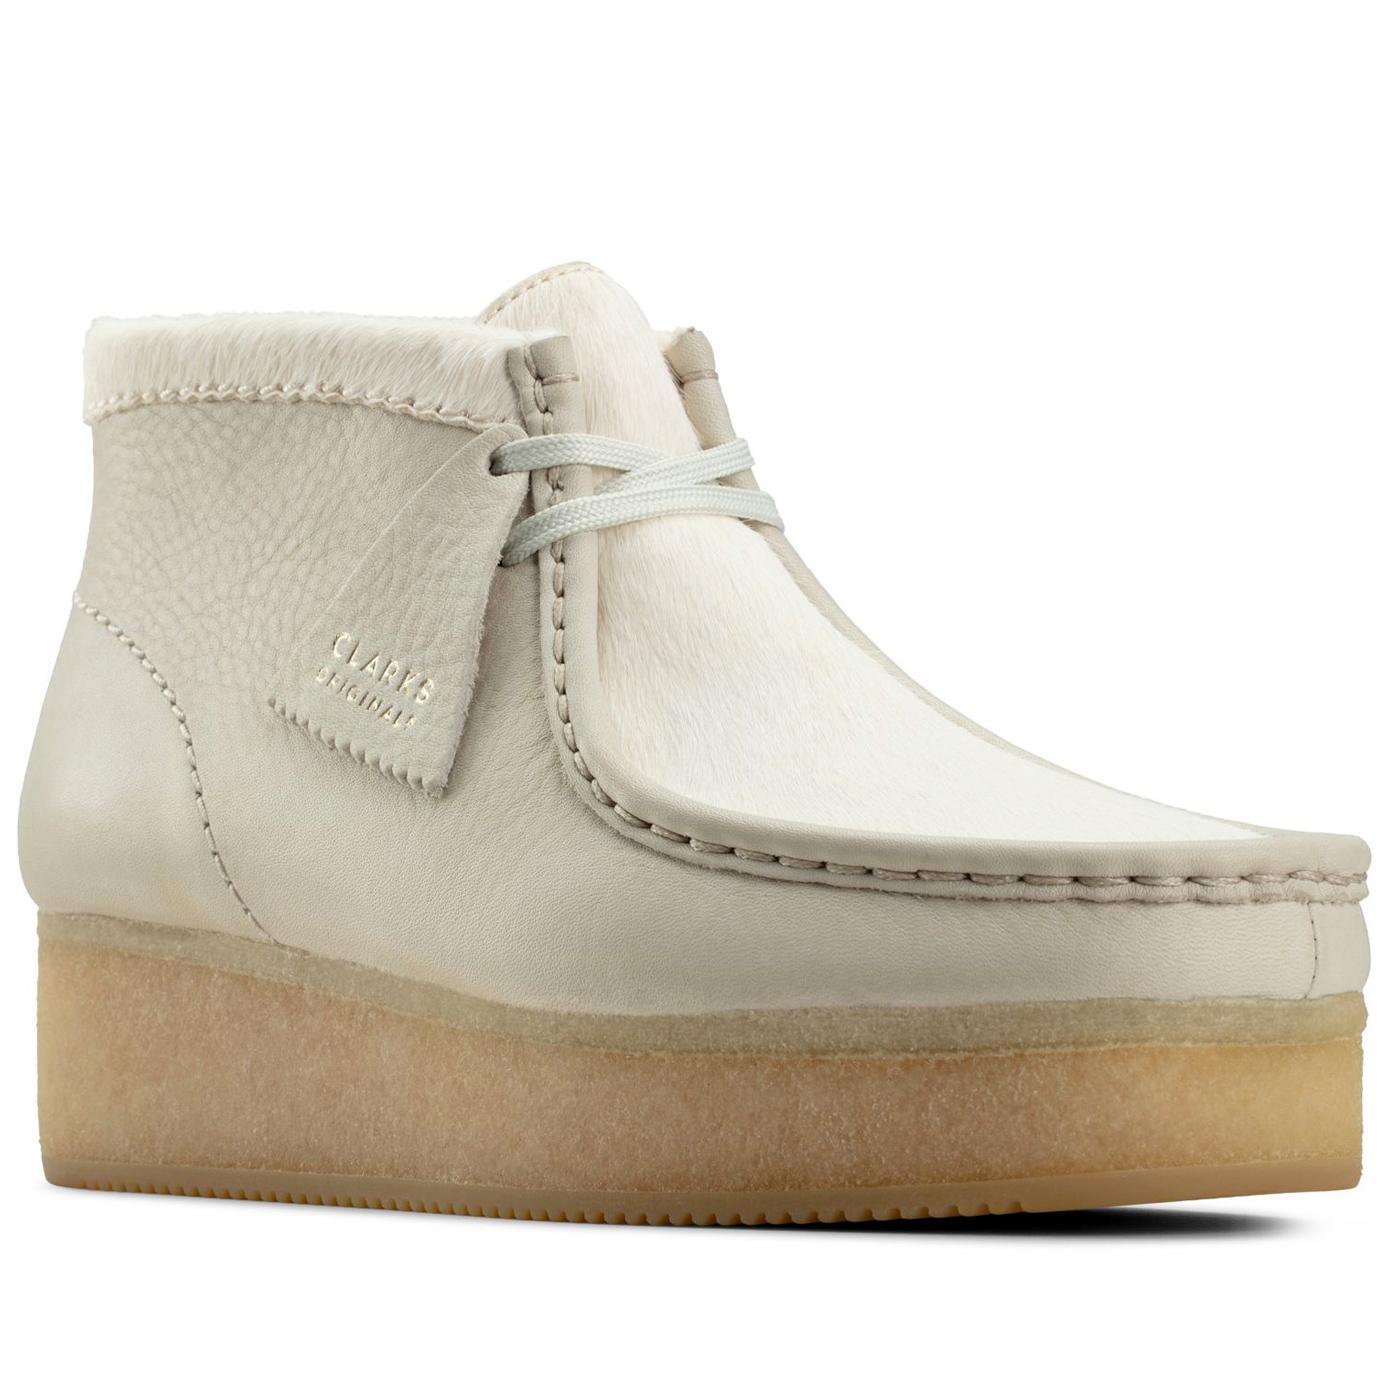 Wallabee Wedge CLARKS ORIGINALS Suede Boots (W)